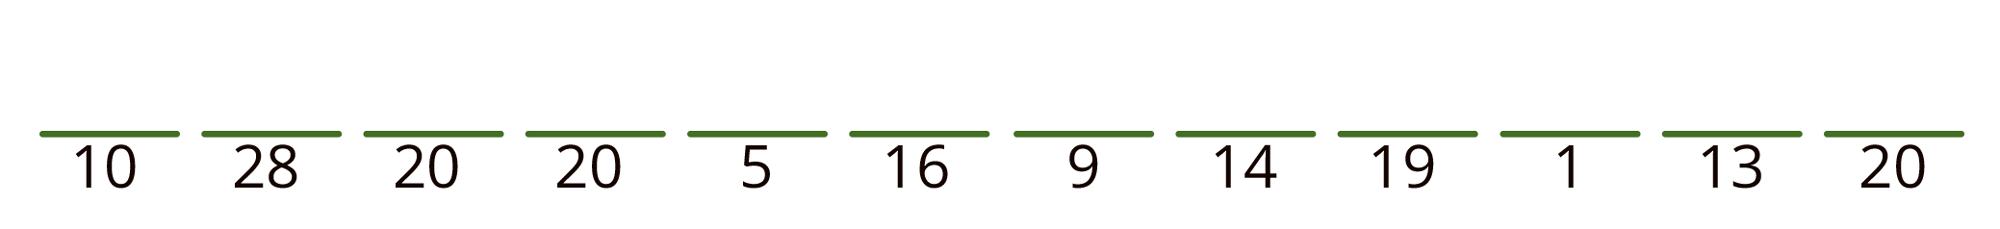 10 28 20 20 5 16 9 14 19 1 13 20